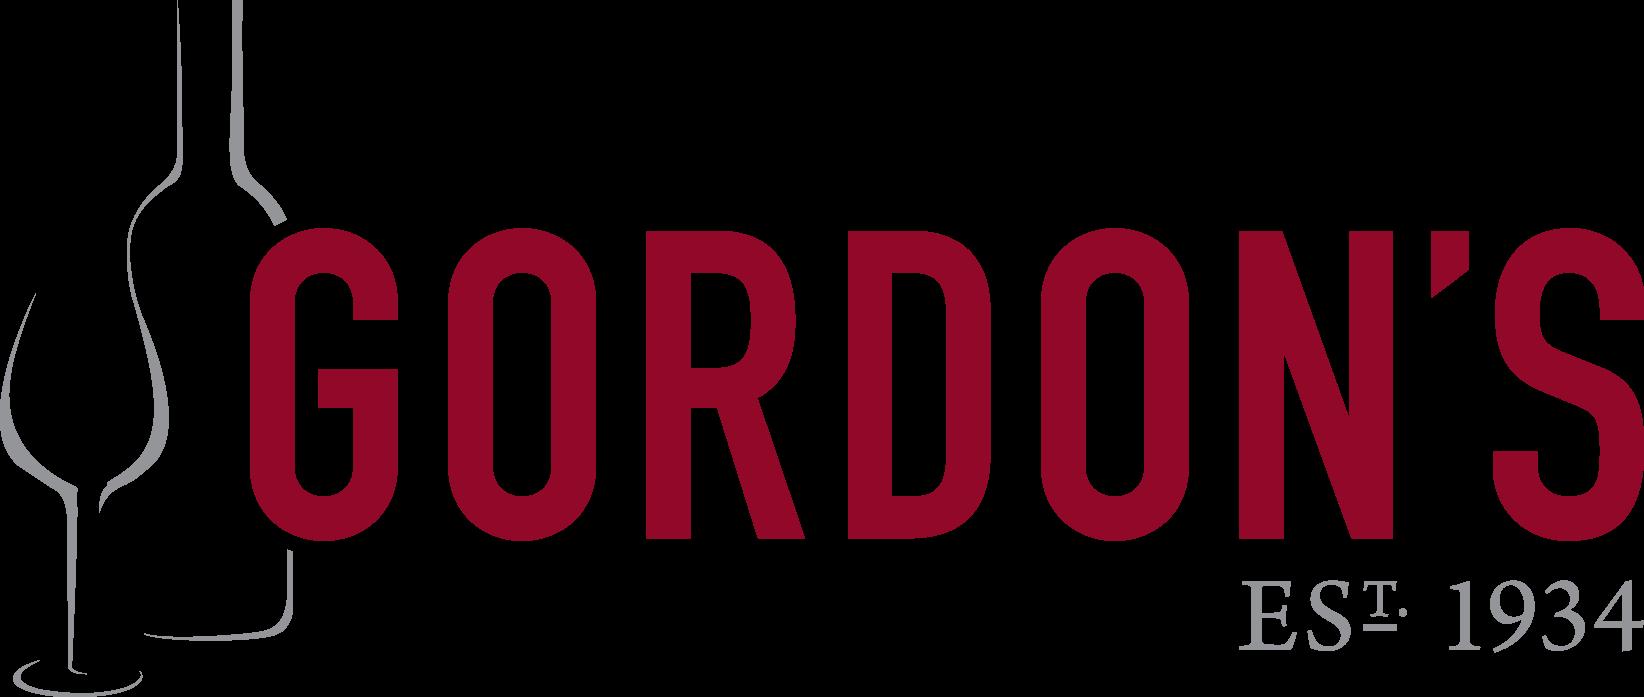 Gordons - Now Open!